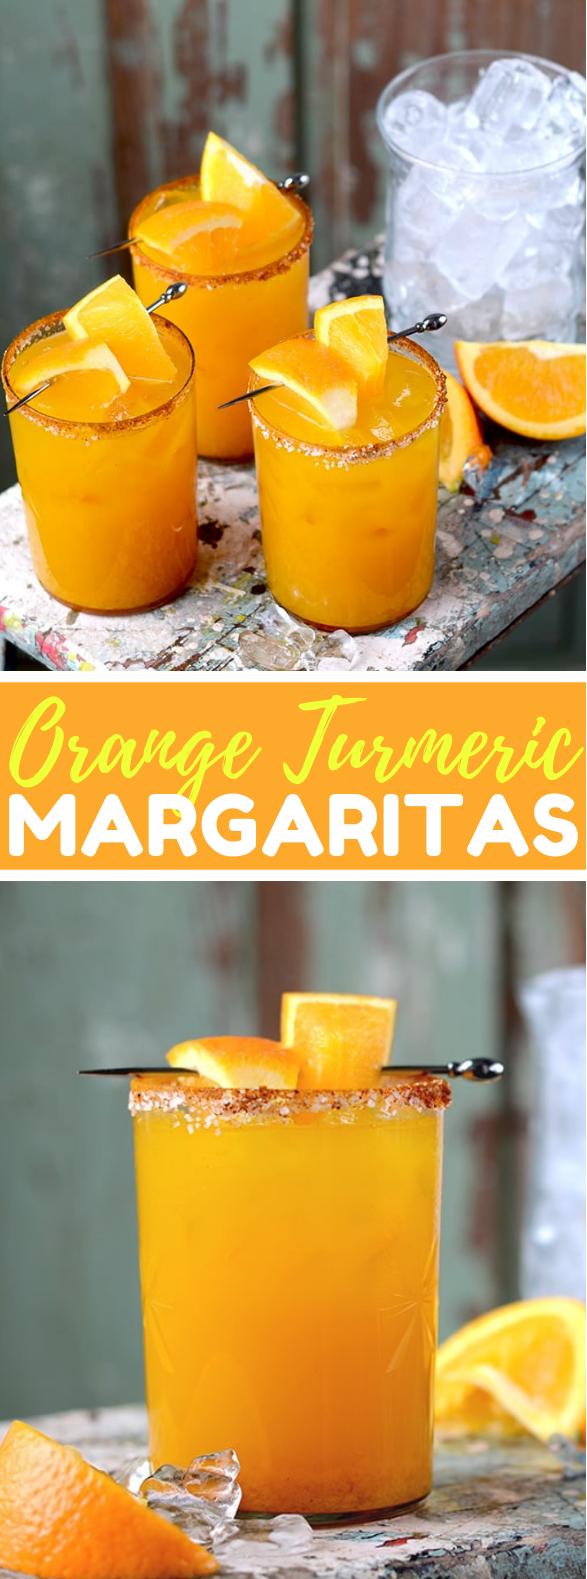 Orange Turmeric Margaritas #drinks #cocktails